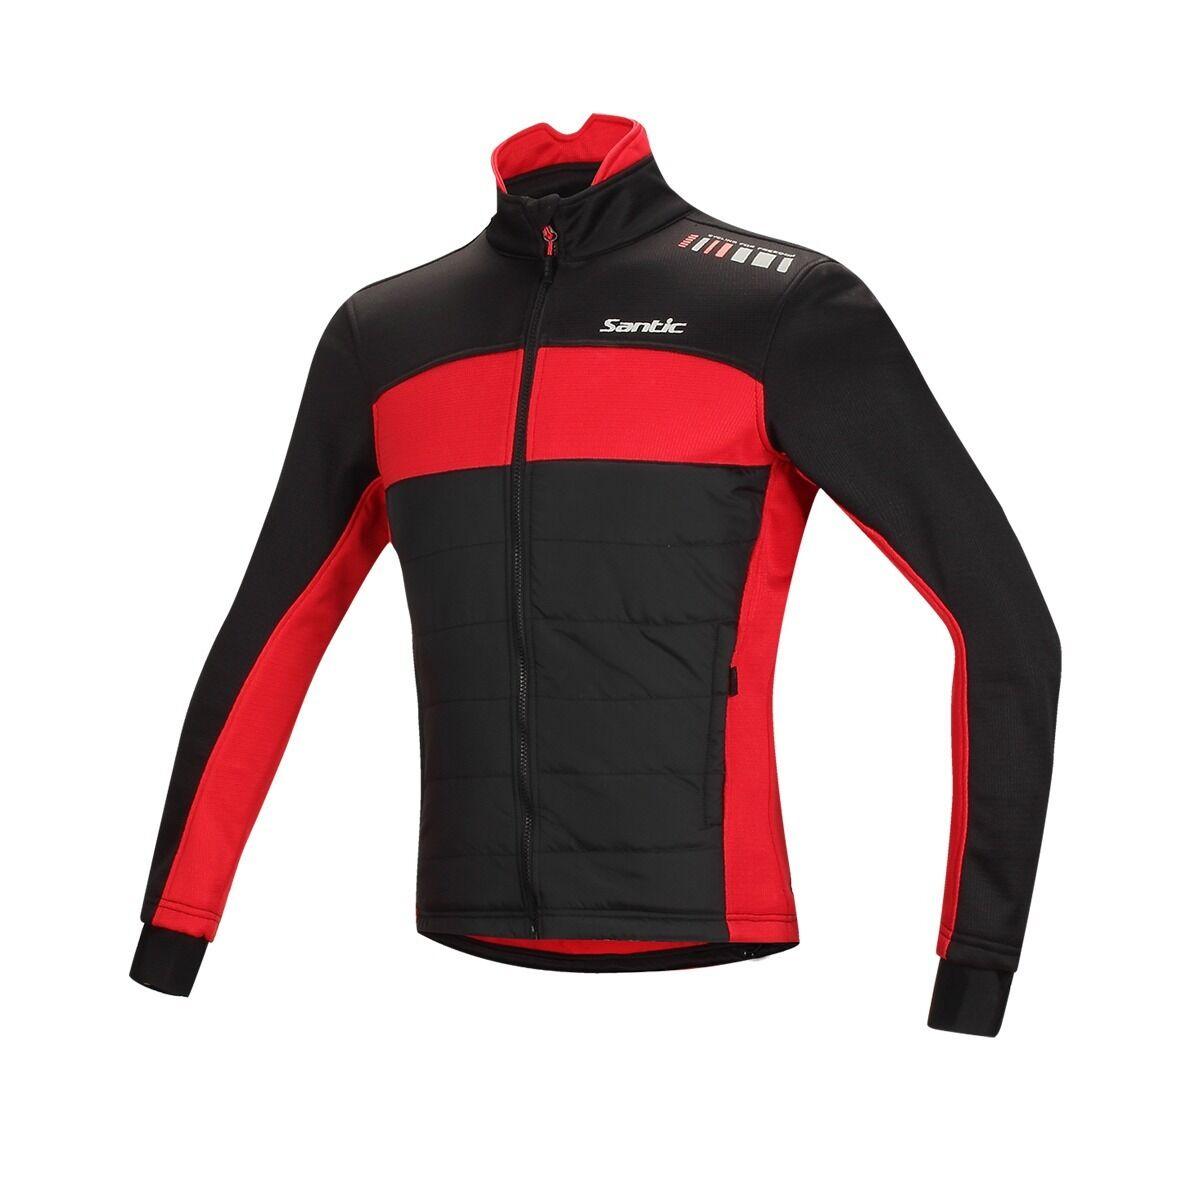 Santic Men's Winter Cycling Clothing Fleece Bike Long sleeve